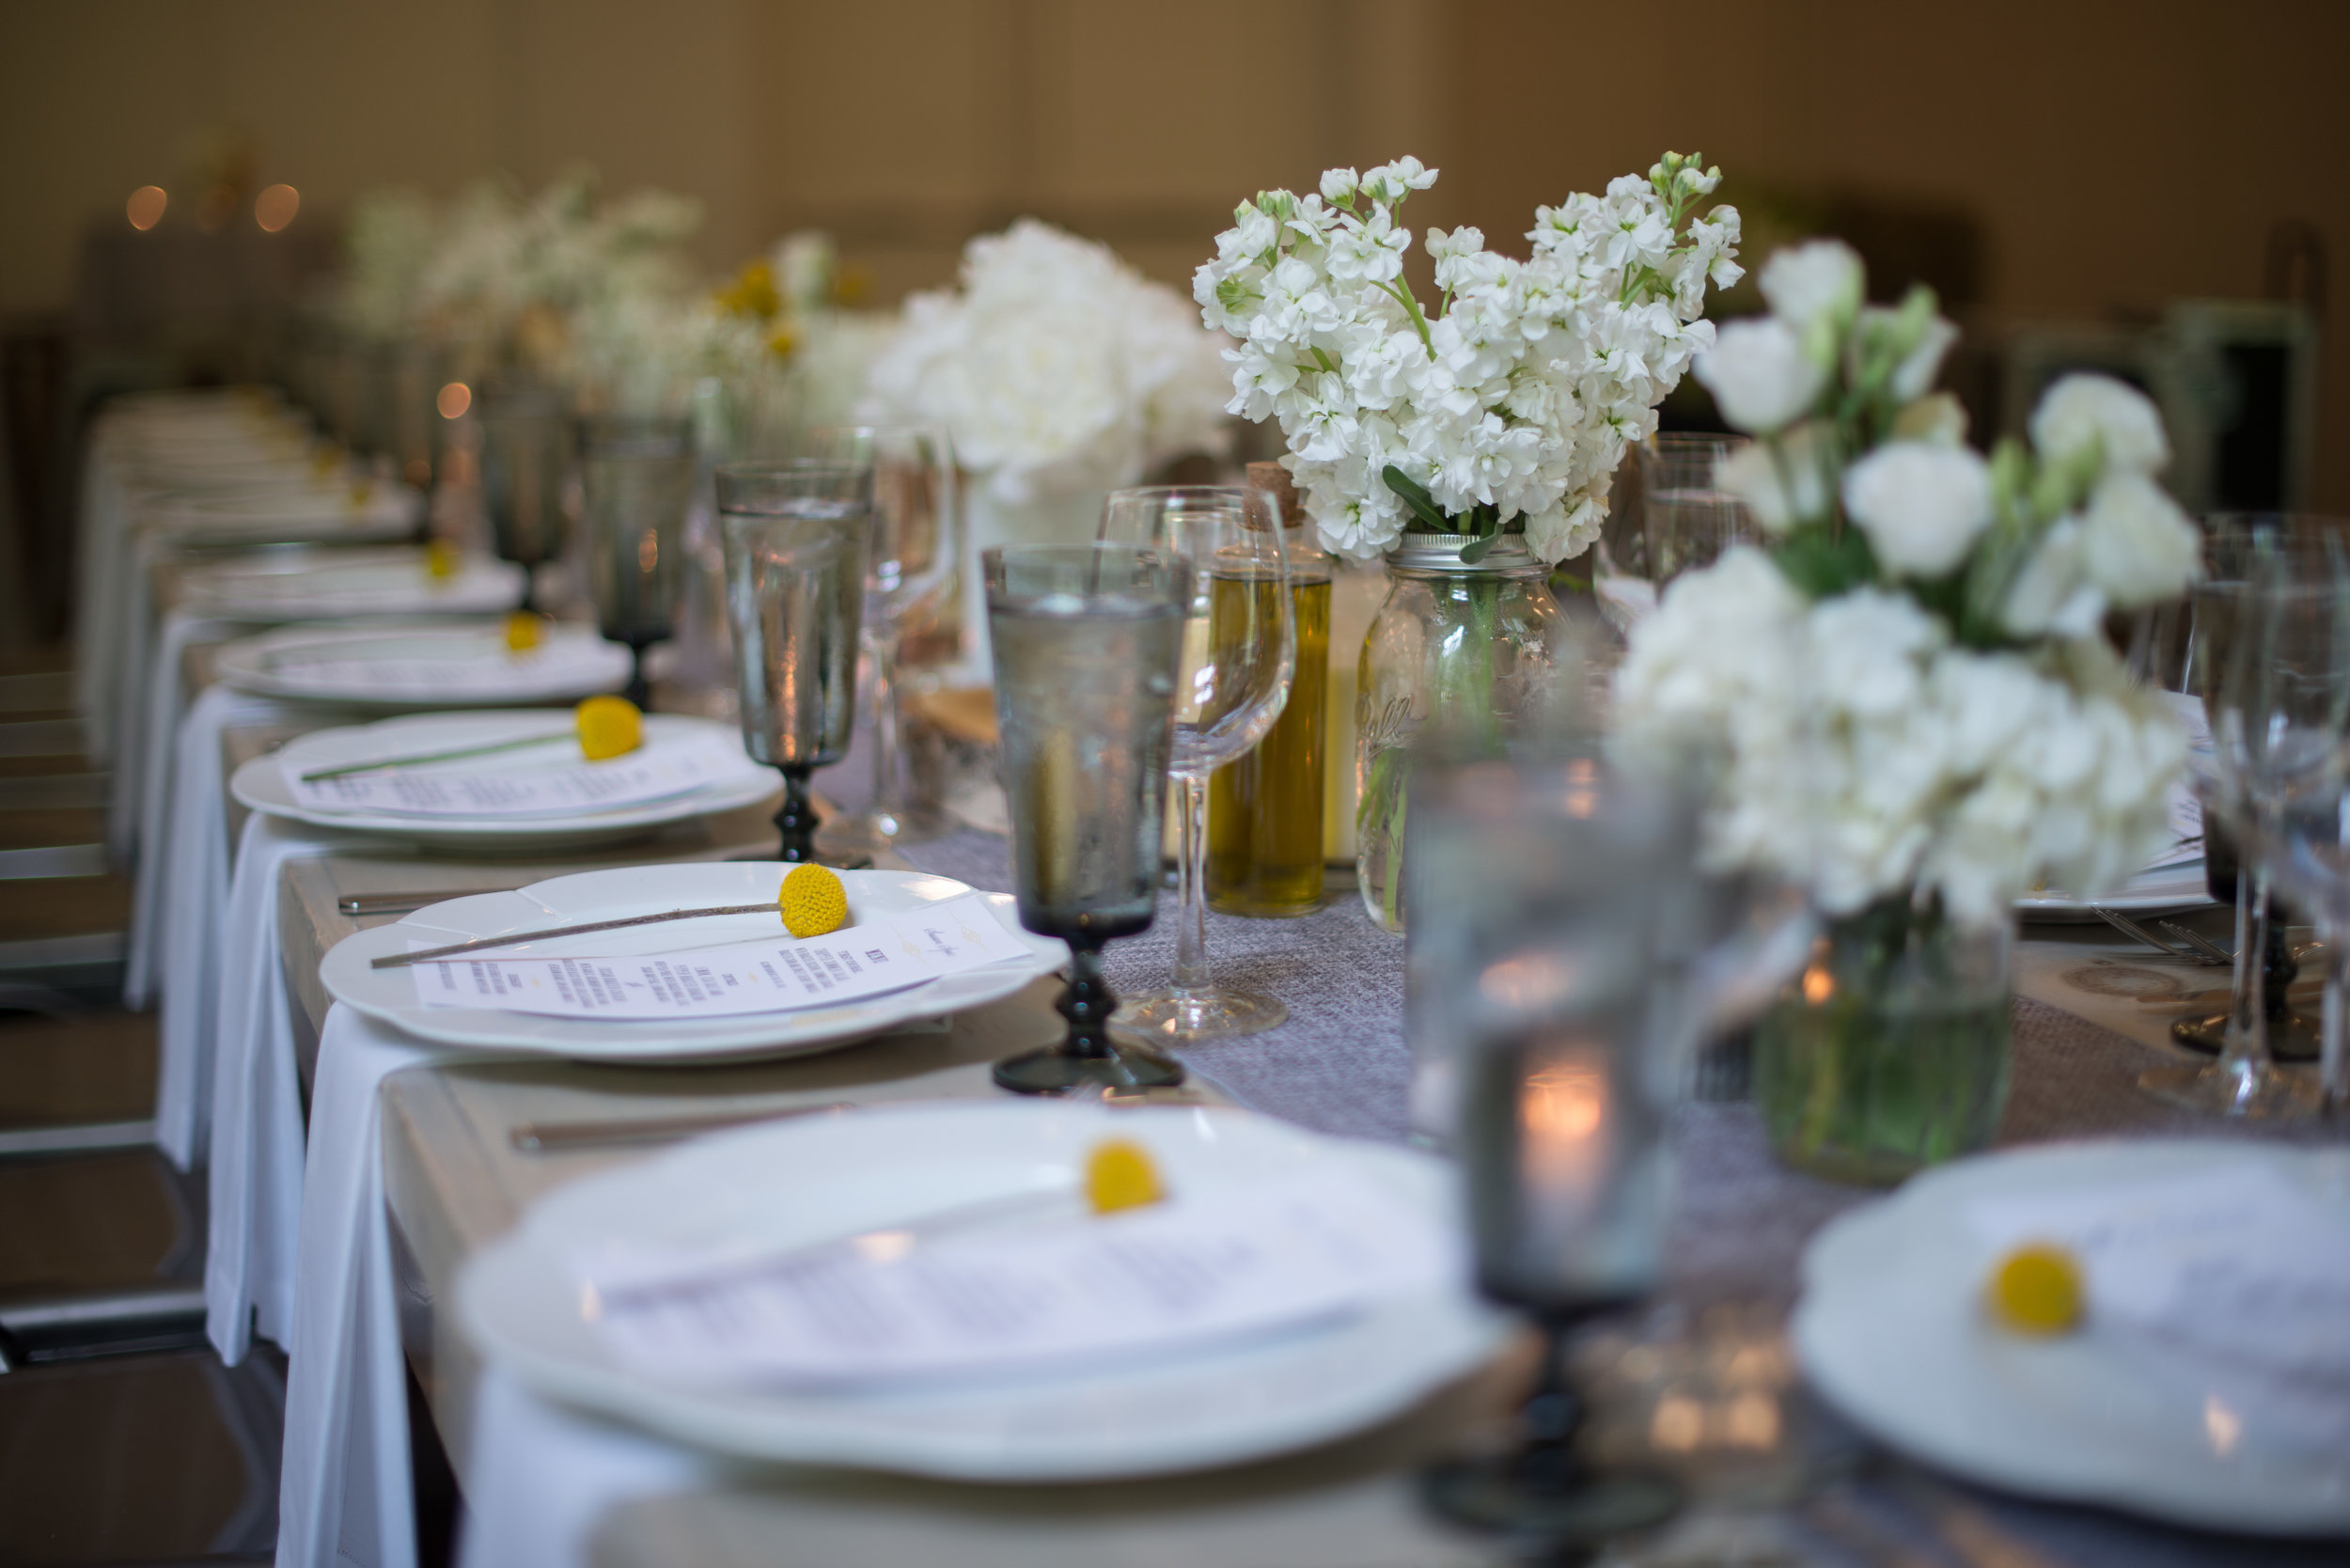 LOVELY LUNCHEON - Venue:Temple B'nai Chaim, Ridgefield, CTPhotography: Pinsky Studio